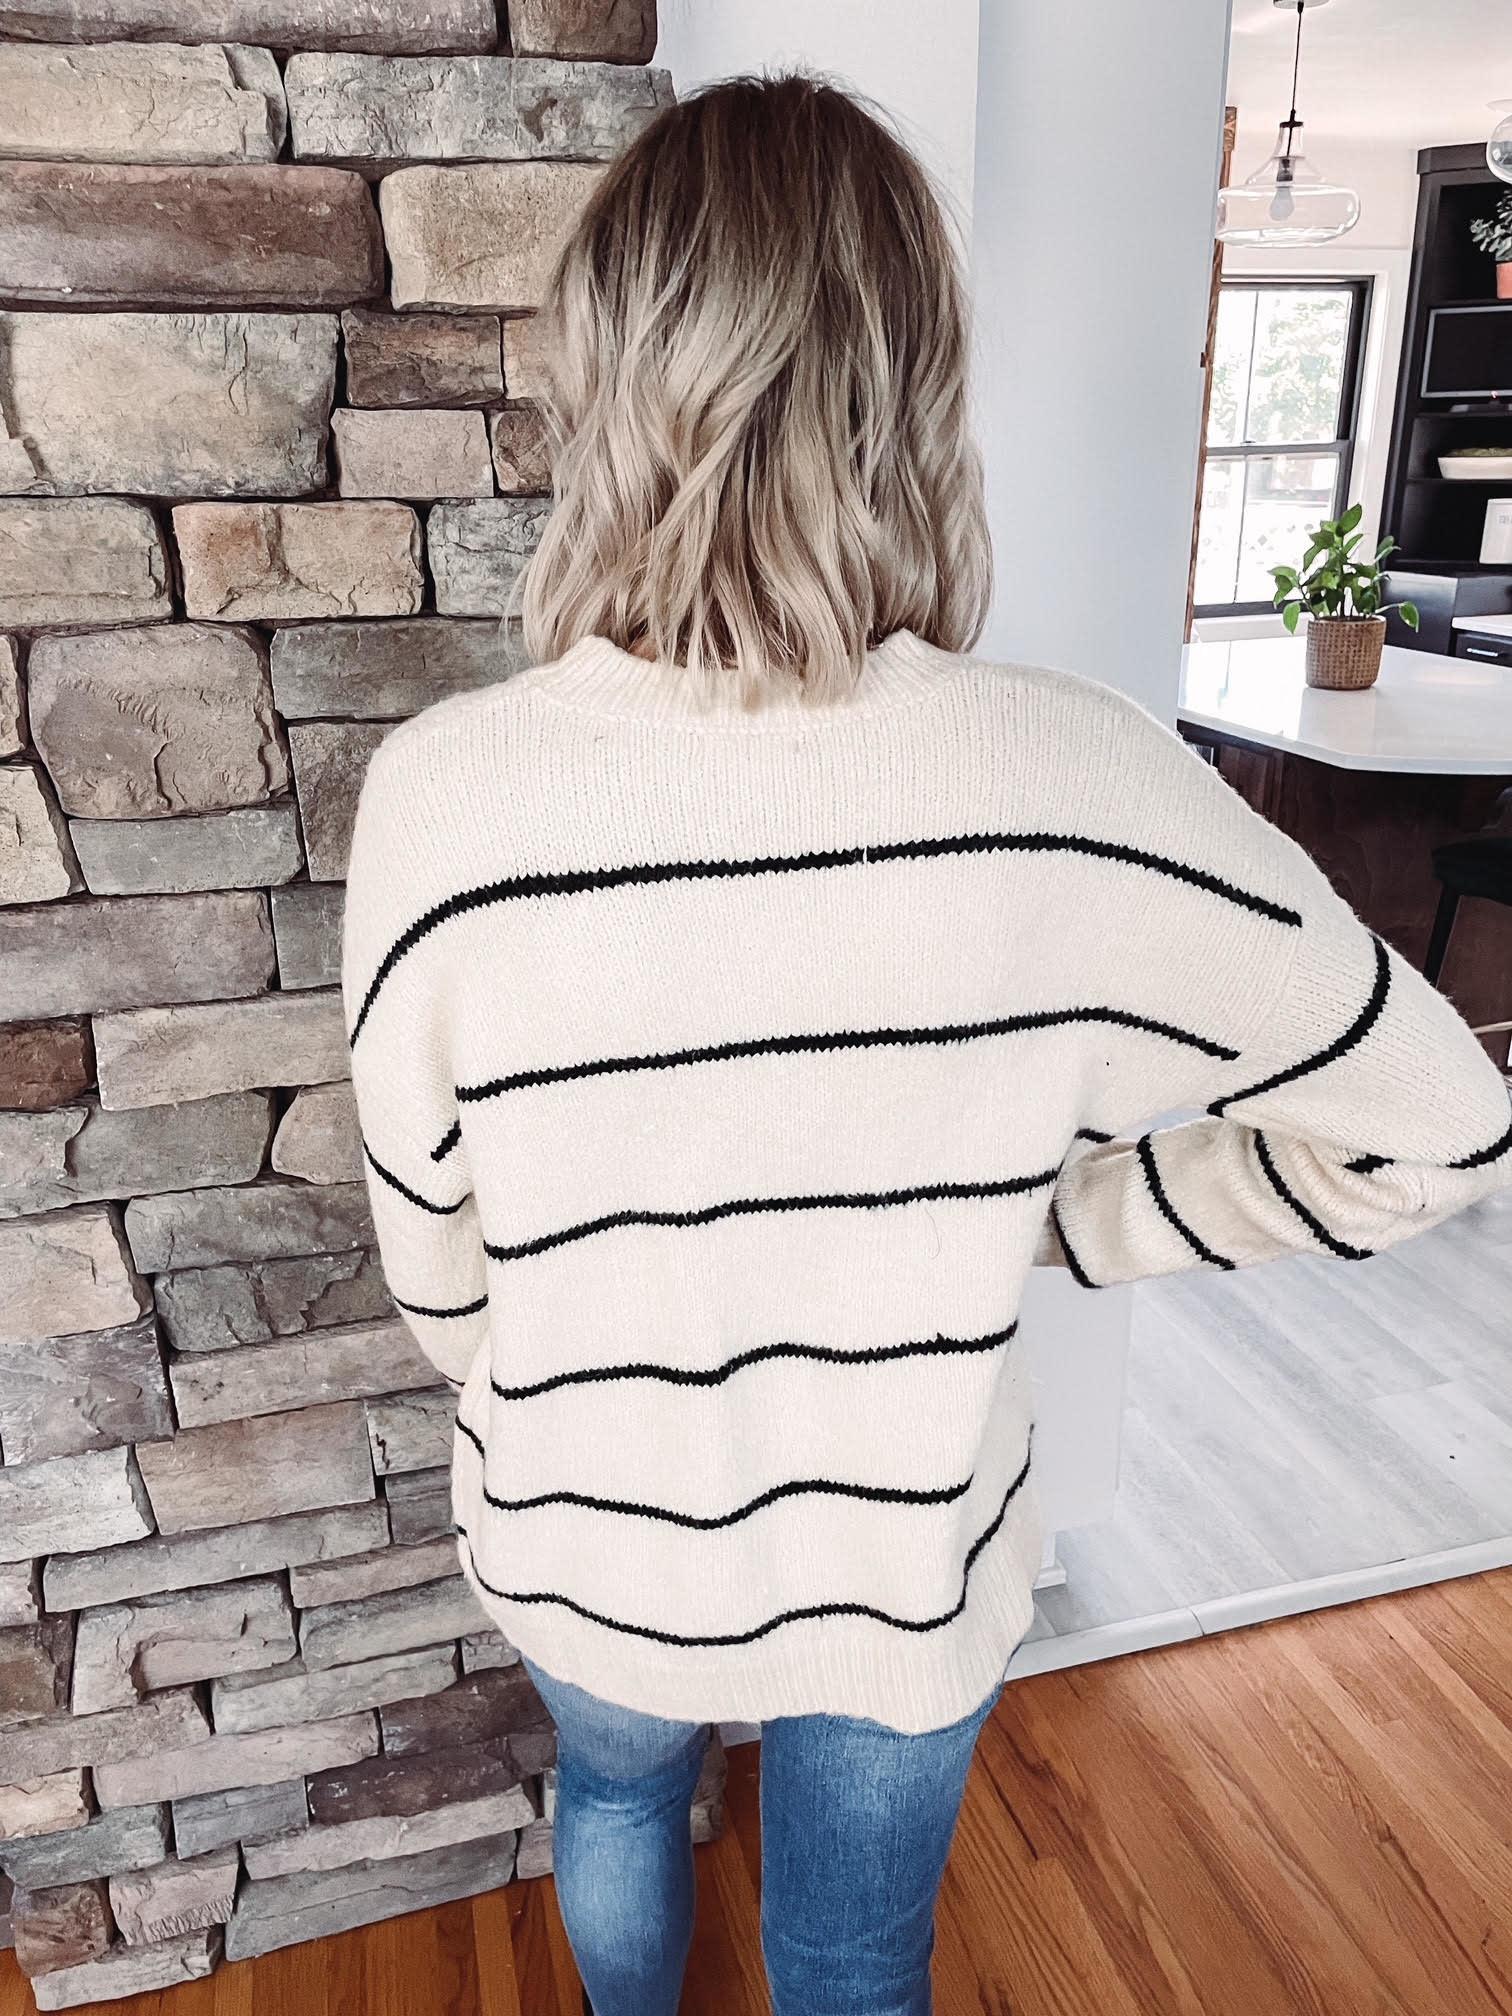 Cora Striped Sweater